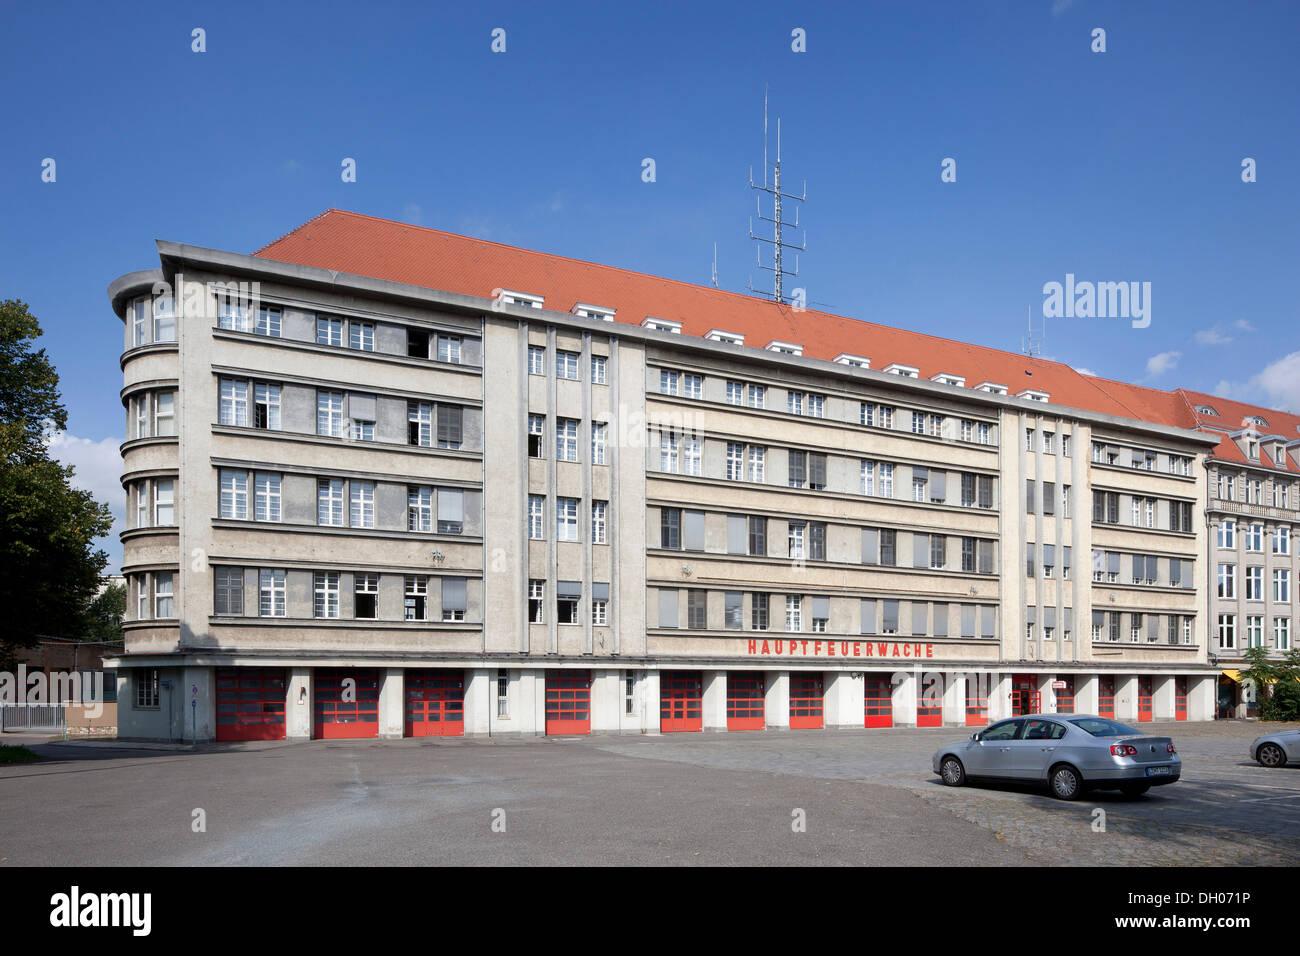 Main fire station, Leipzig, PublicGround - Stock Image